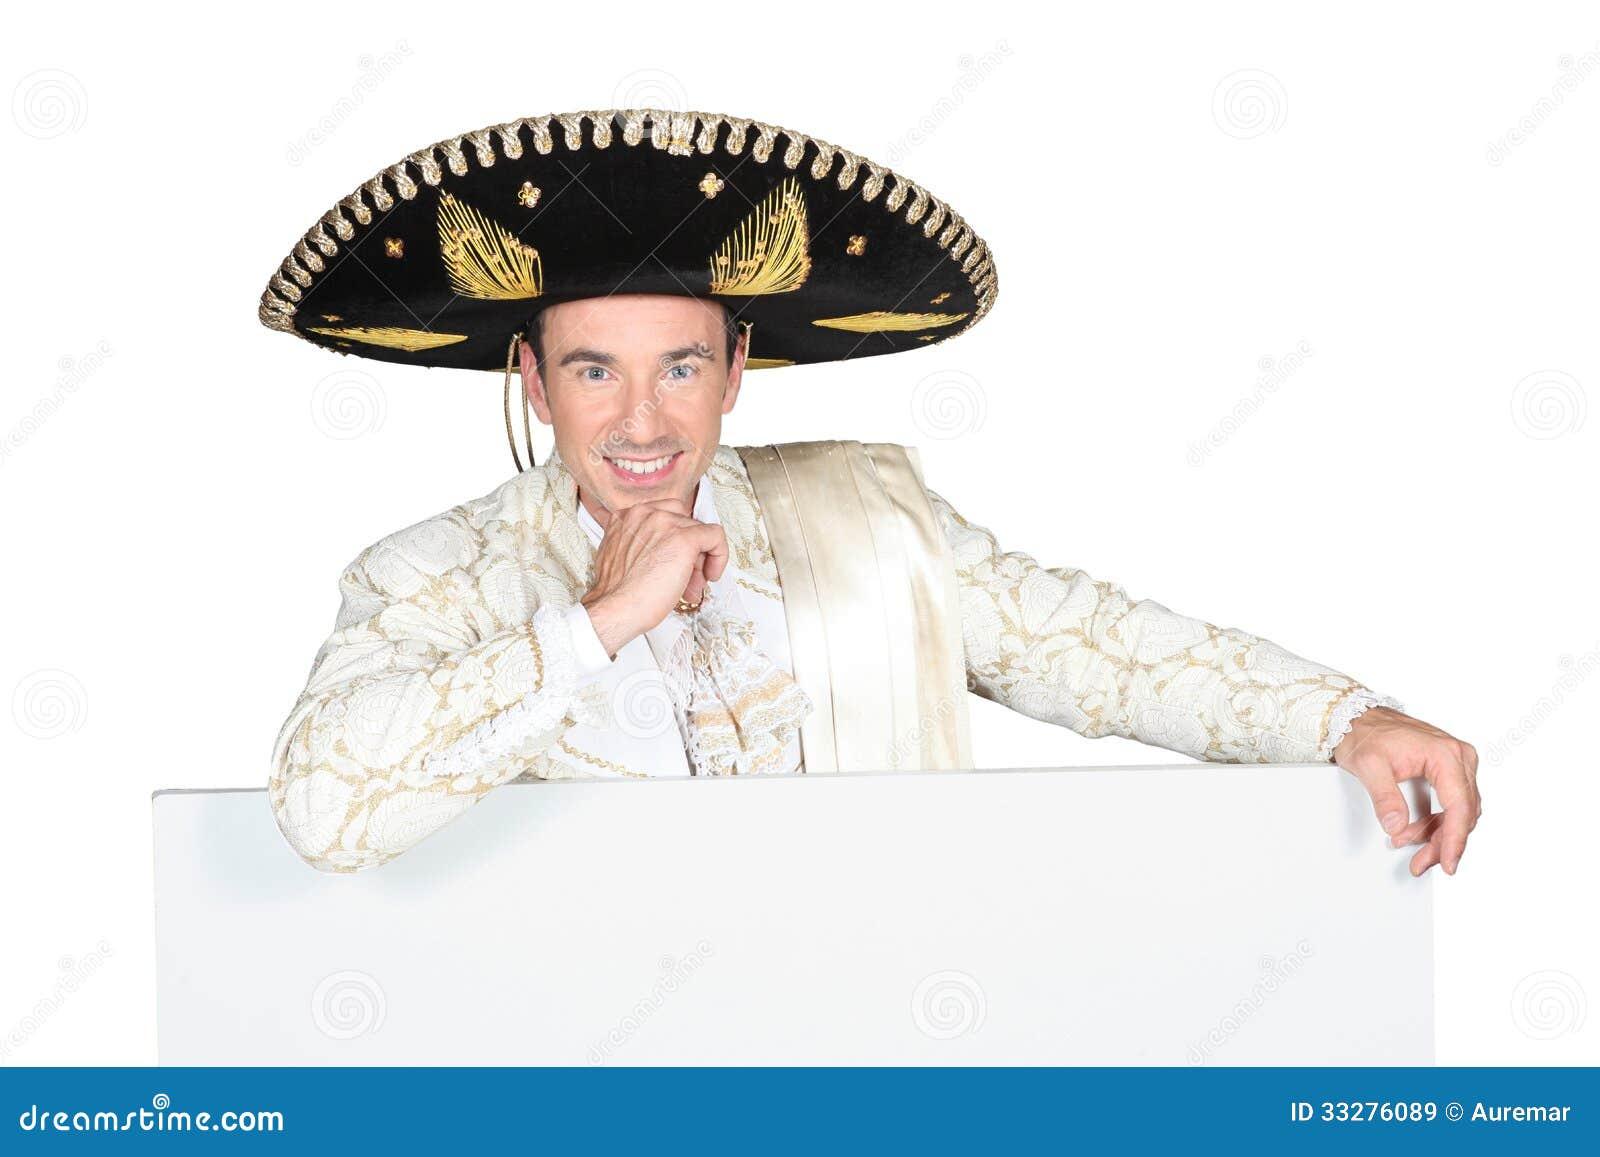 Man Wearing Sombrero Royalty Free Stock Images - Image: 33276089